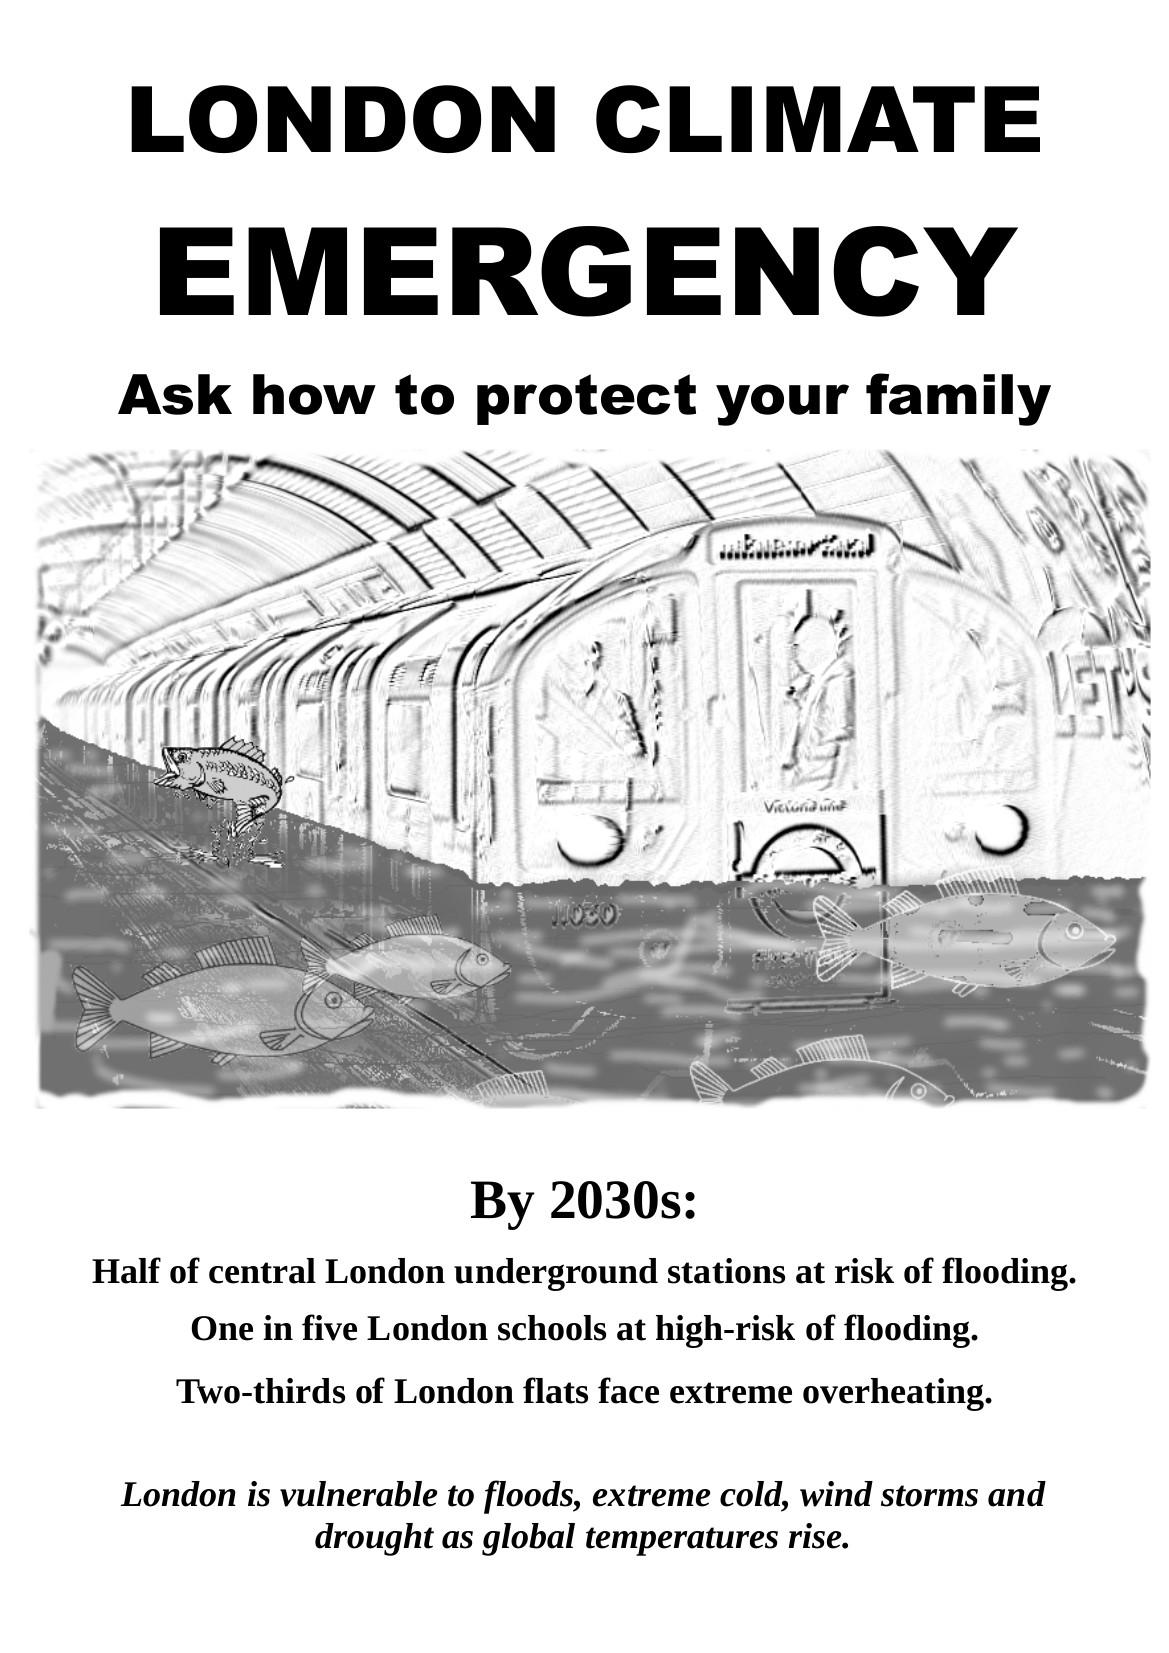 LondonClimateEmergencyPoster